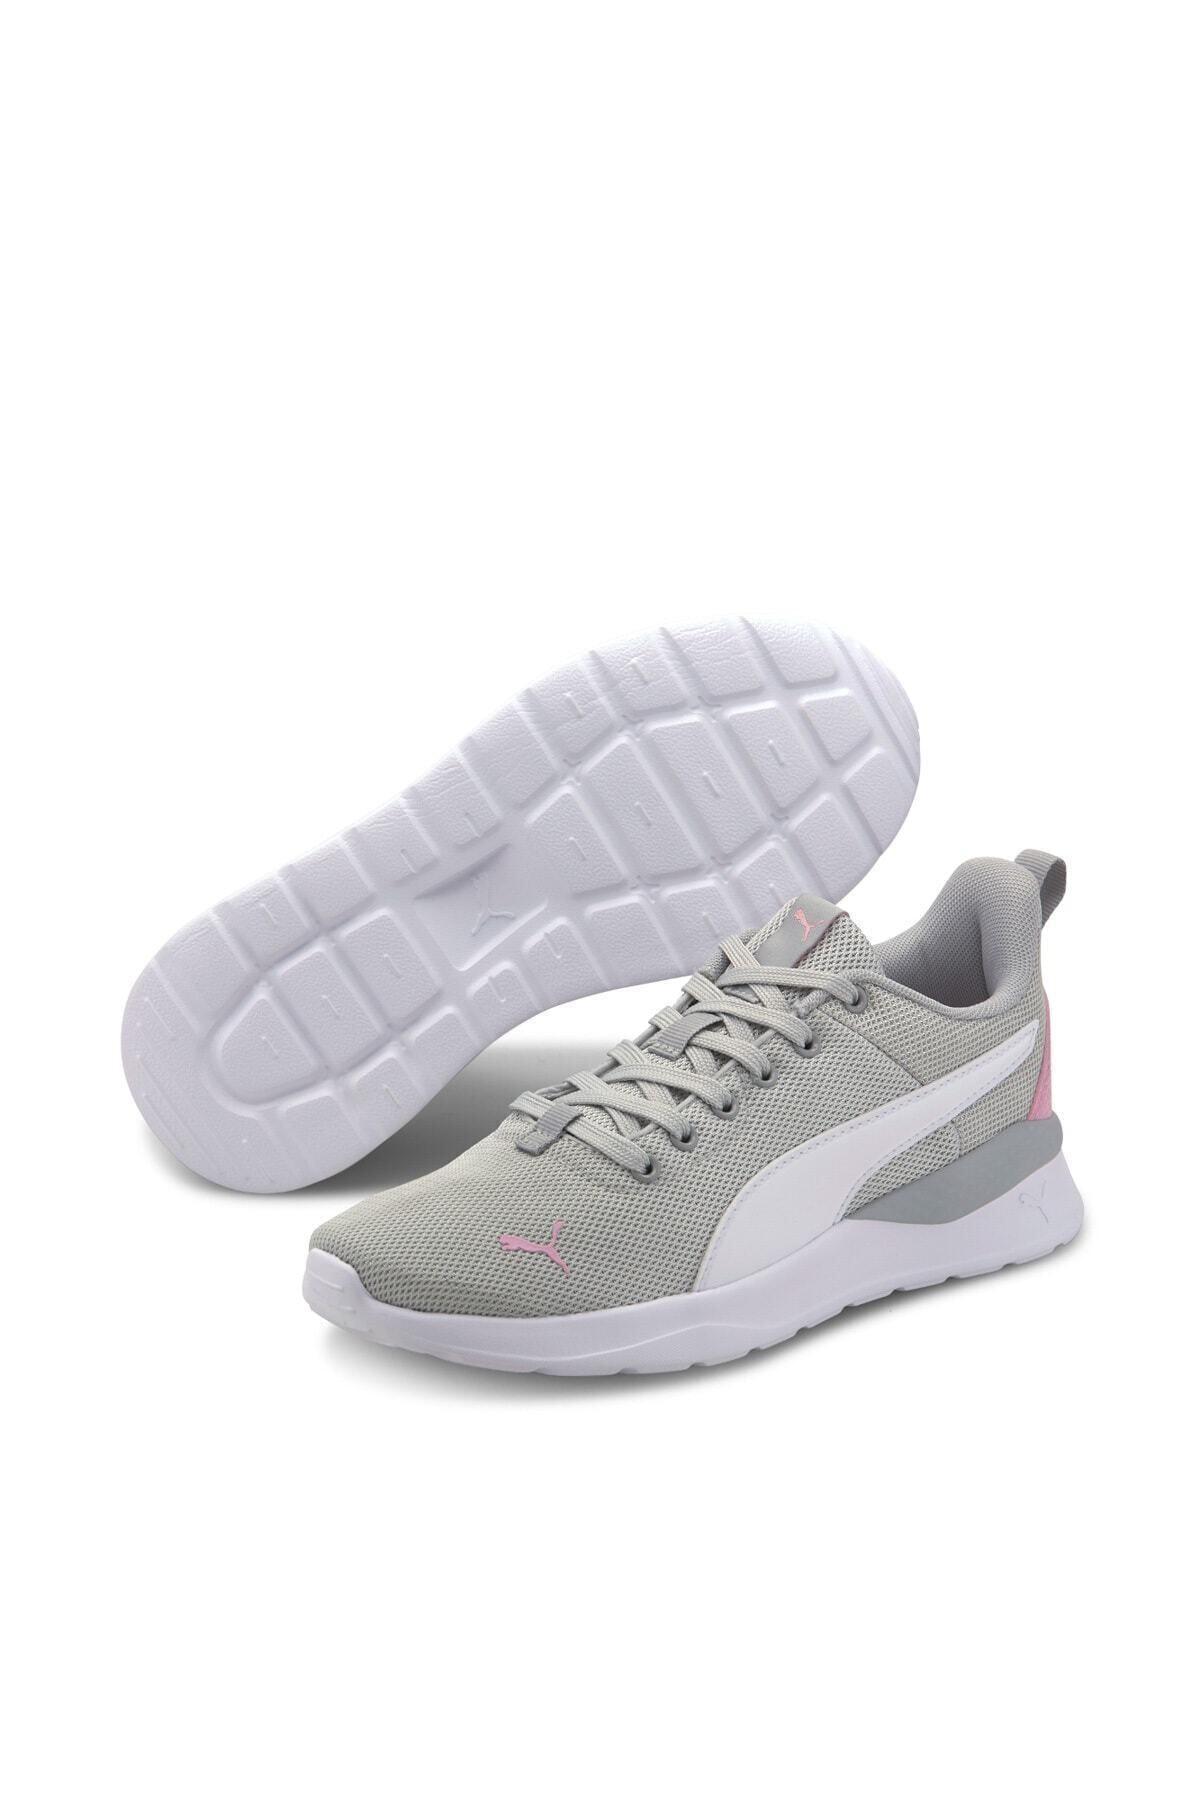 Puma ANZARUN LITE METALLIC JR Gri Kız Çocuk Koşu Ayakkabısı 100660667 1